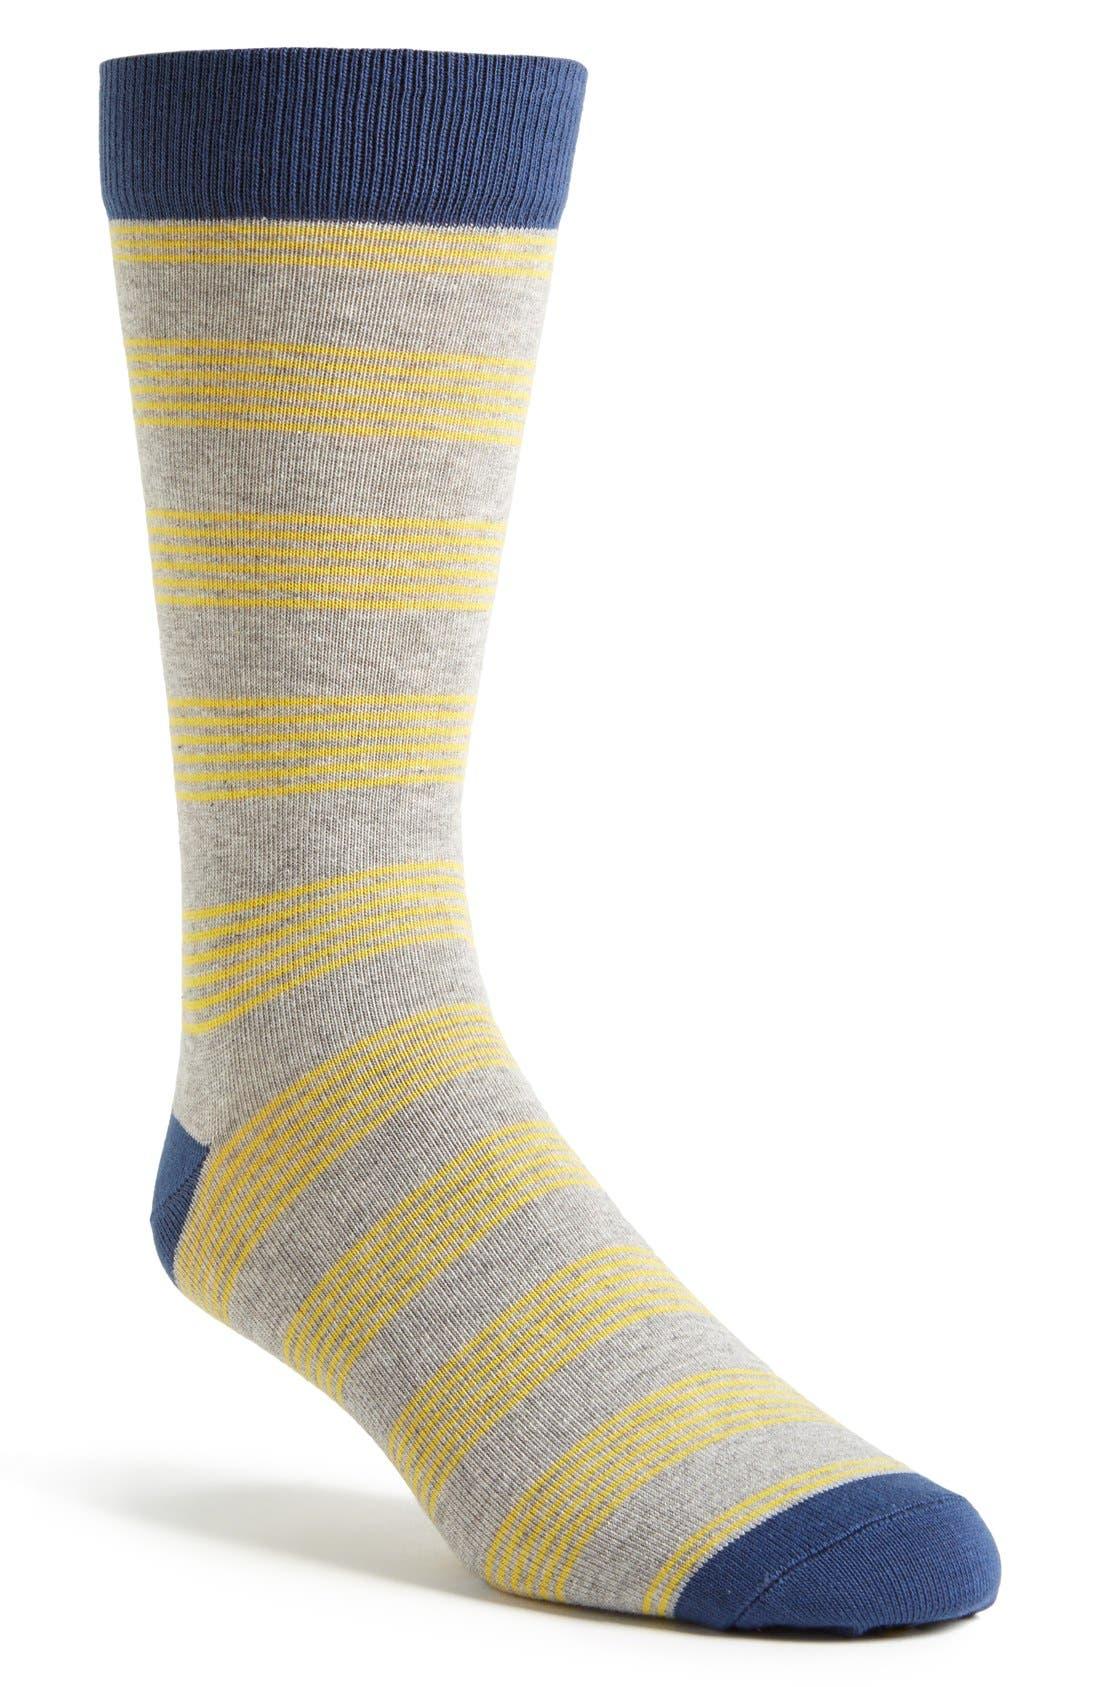 Main Image - PACT 'Picnic Stripe' Crew Socks